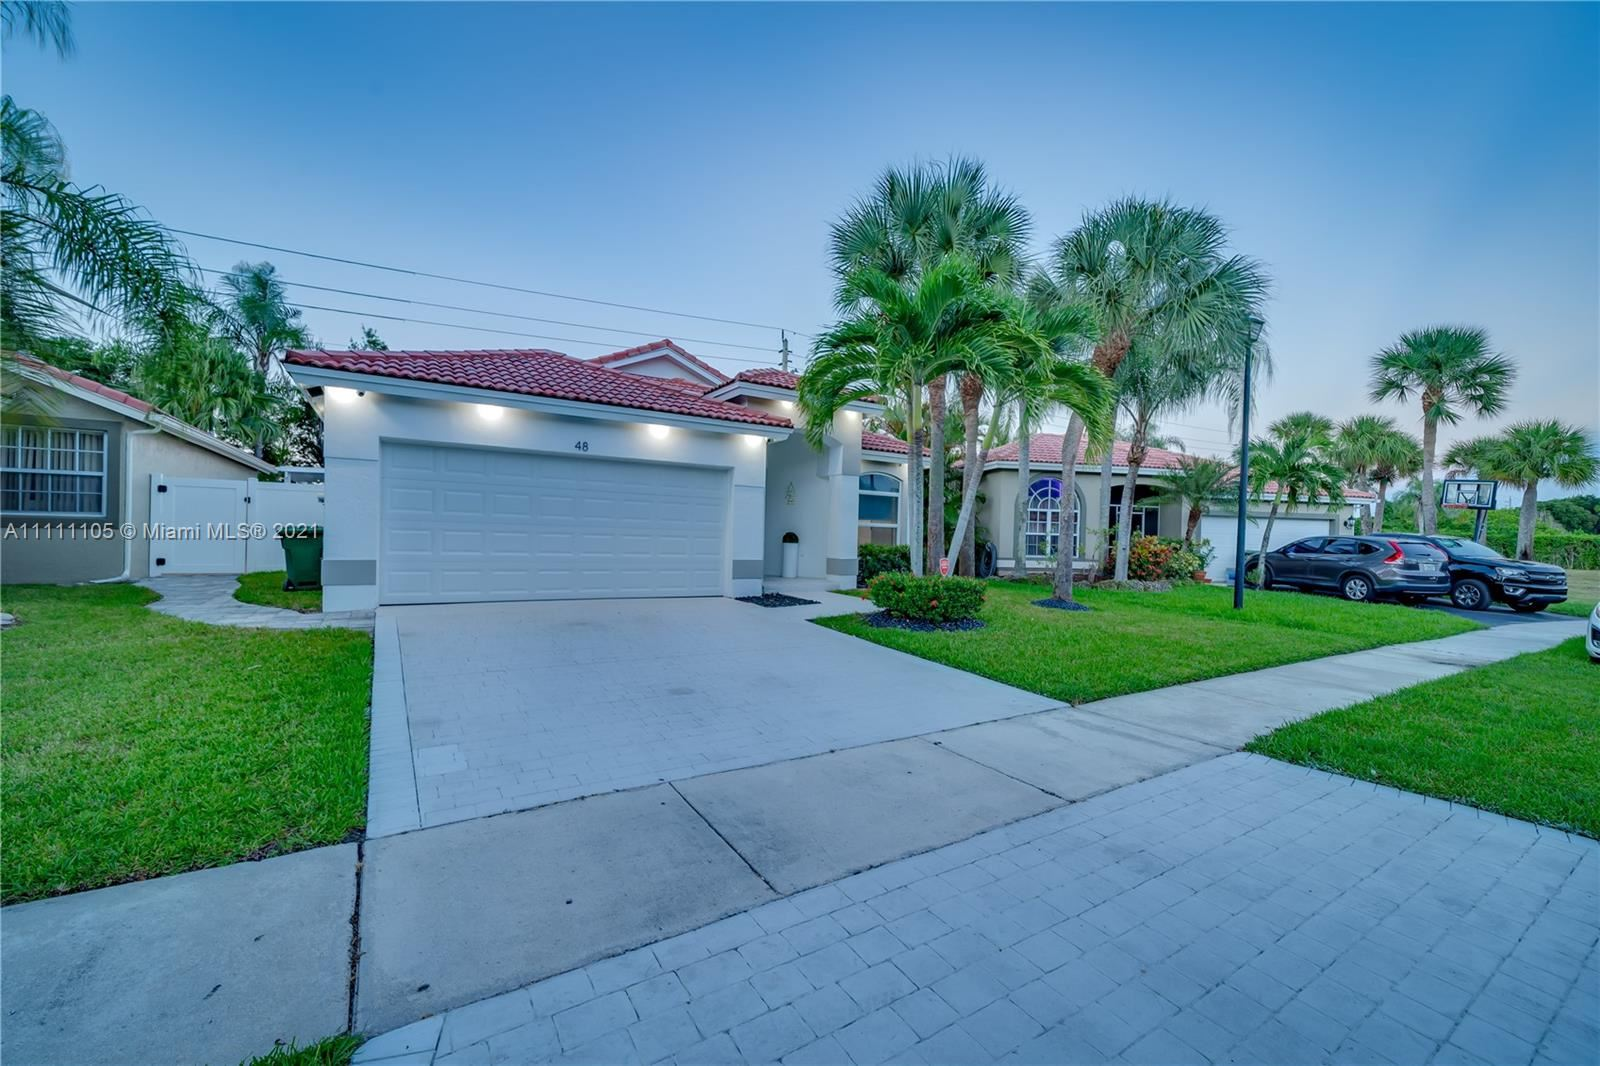 Photo of 48 Gables Blvd, Weston, FL 33326 (MLS # A11111105)